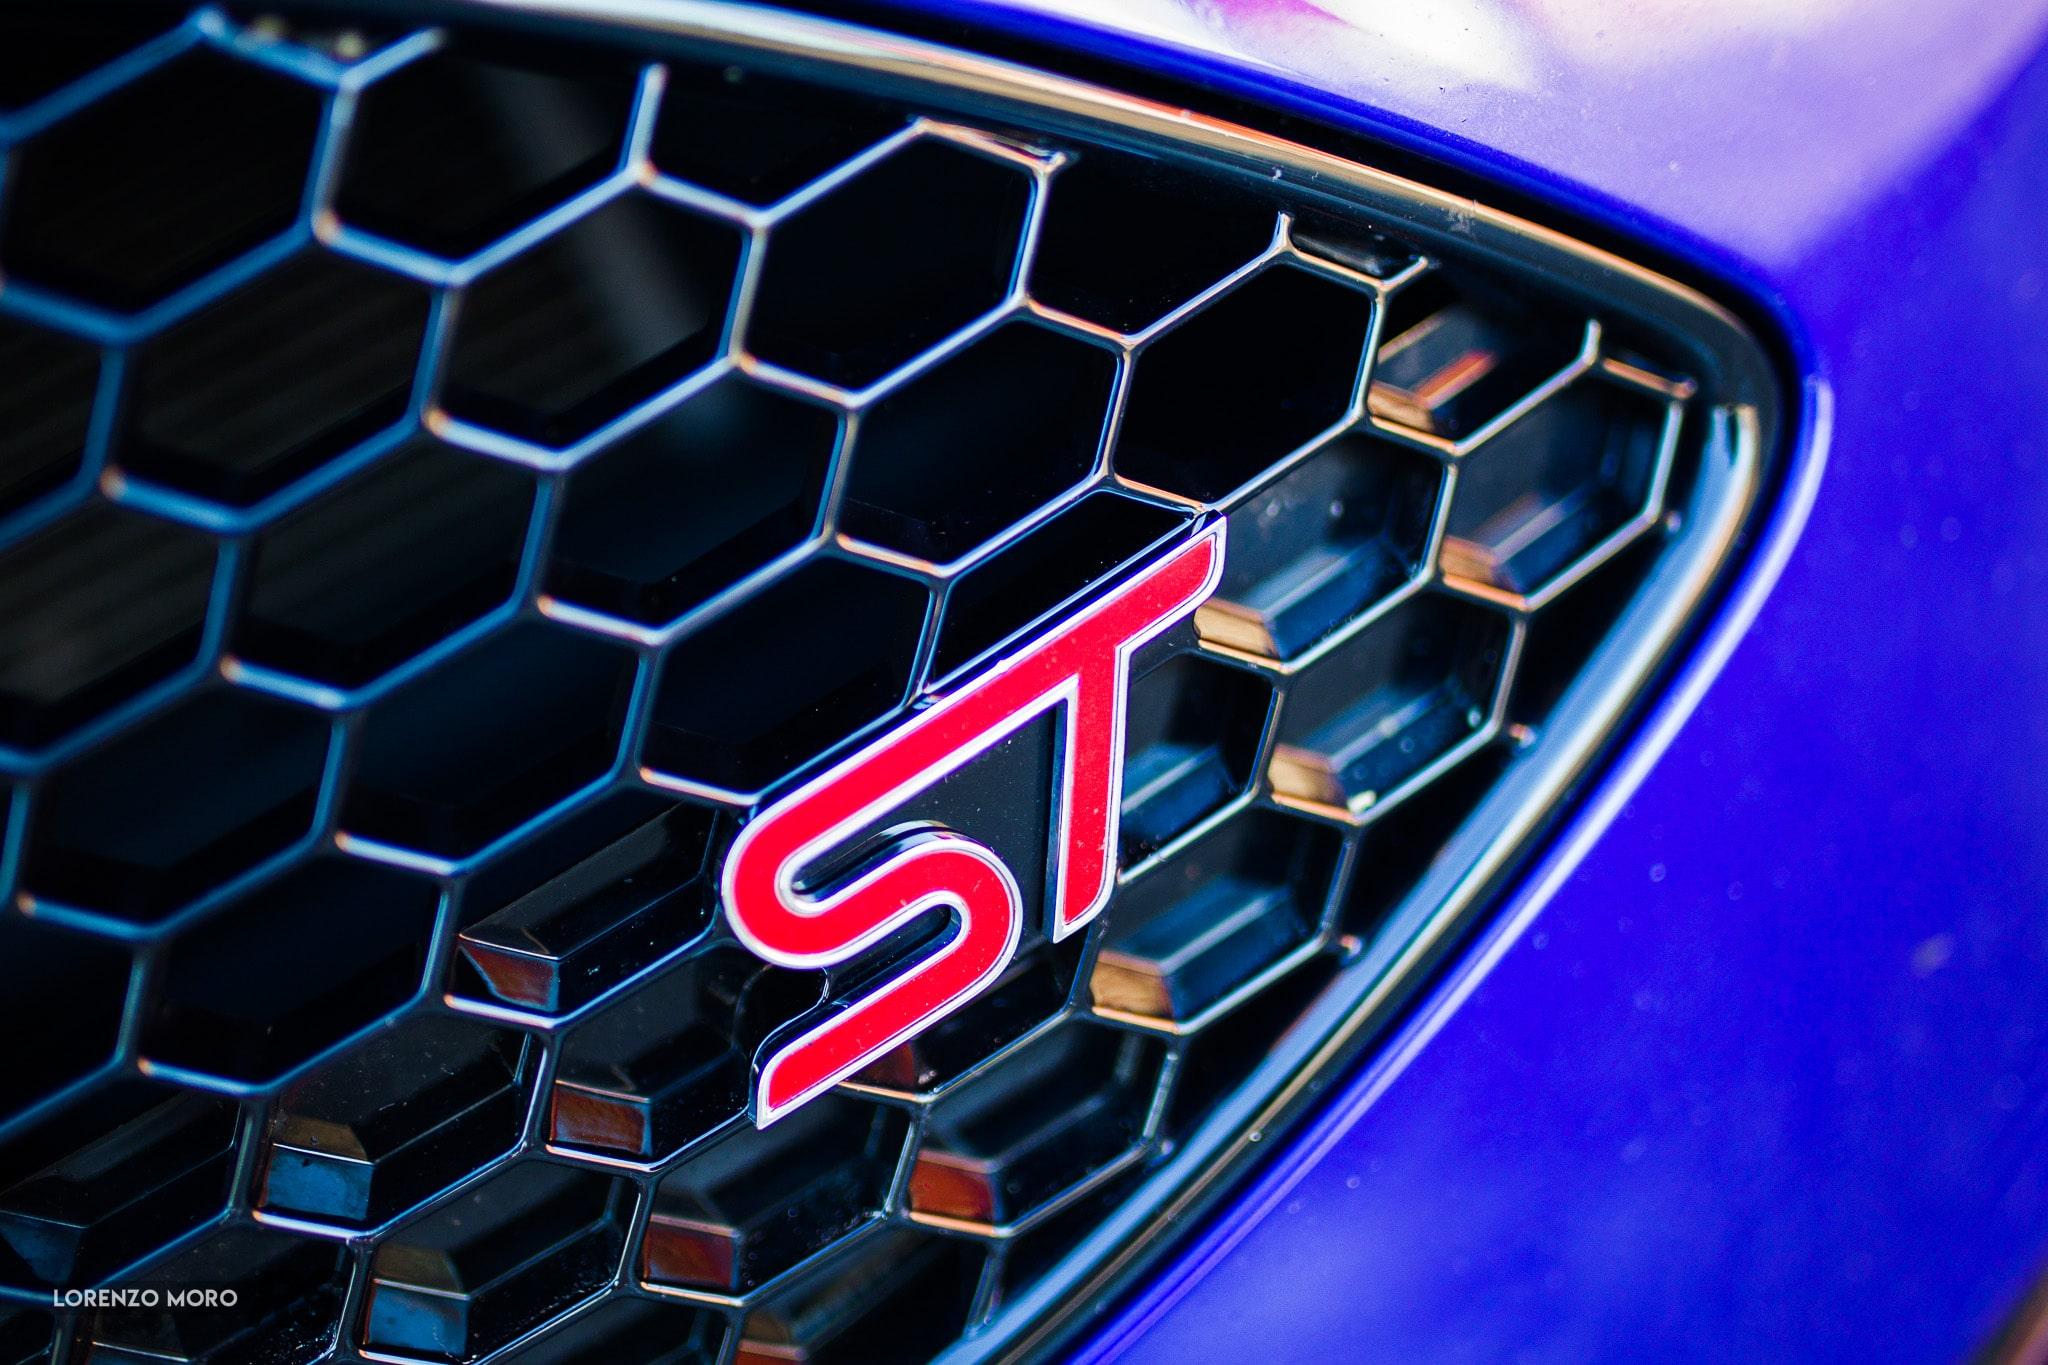 Fiesta ST 182 logo